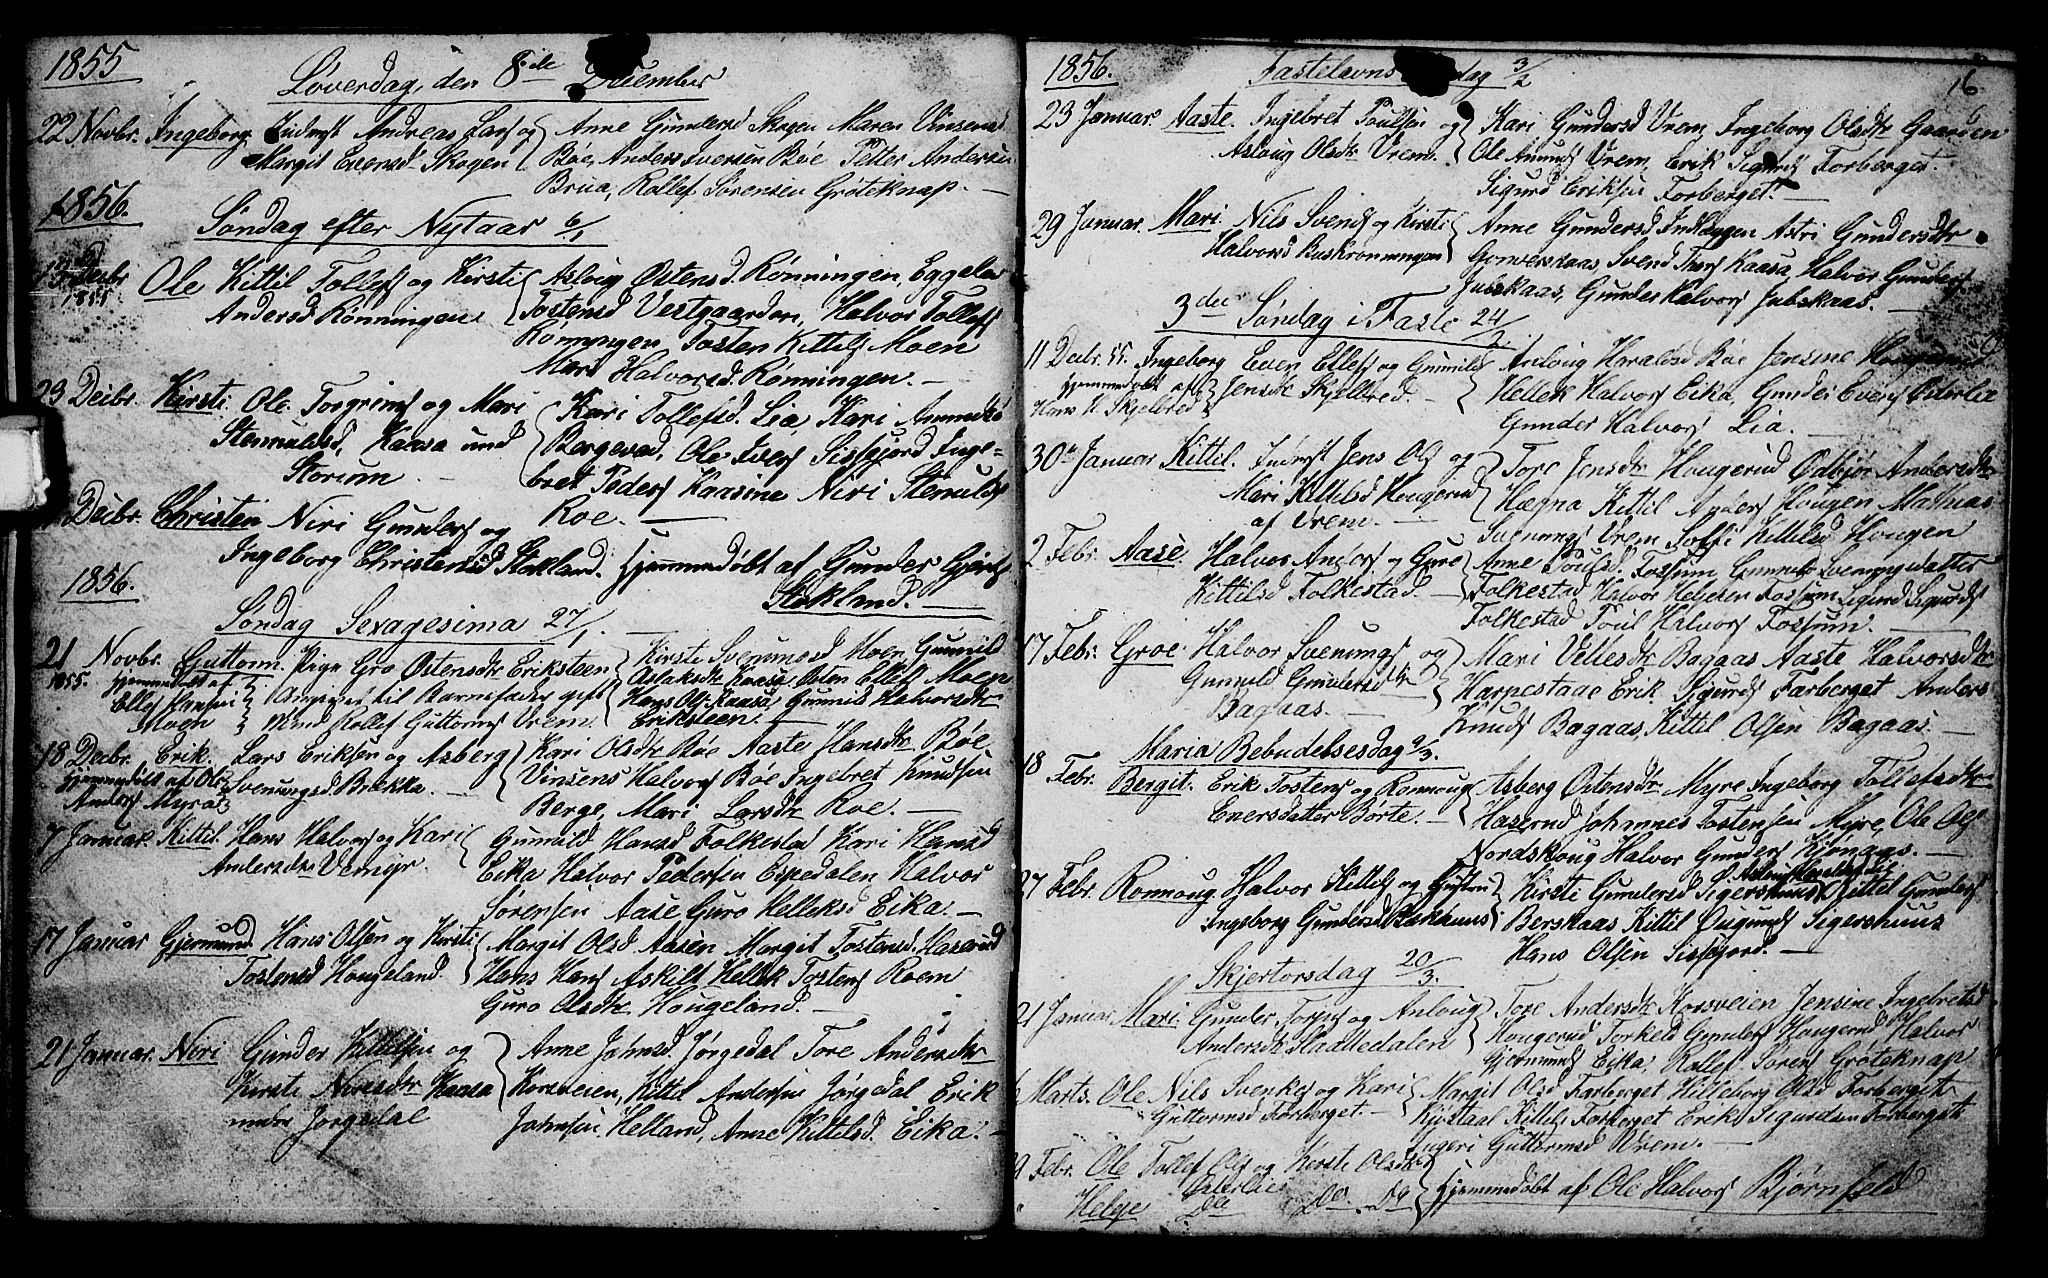 SAKO, Bø kirkebøker, G/Ga/L0002: Klokkerbok nr. 2, 1853-1866, s. 16